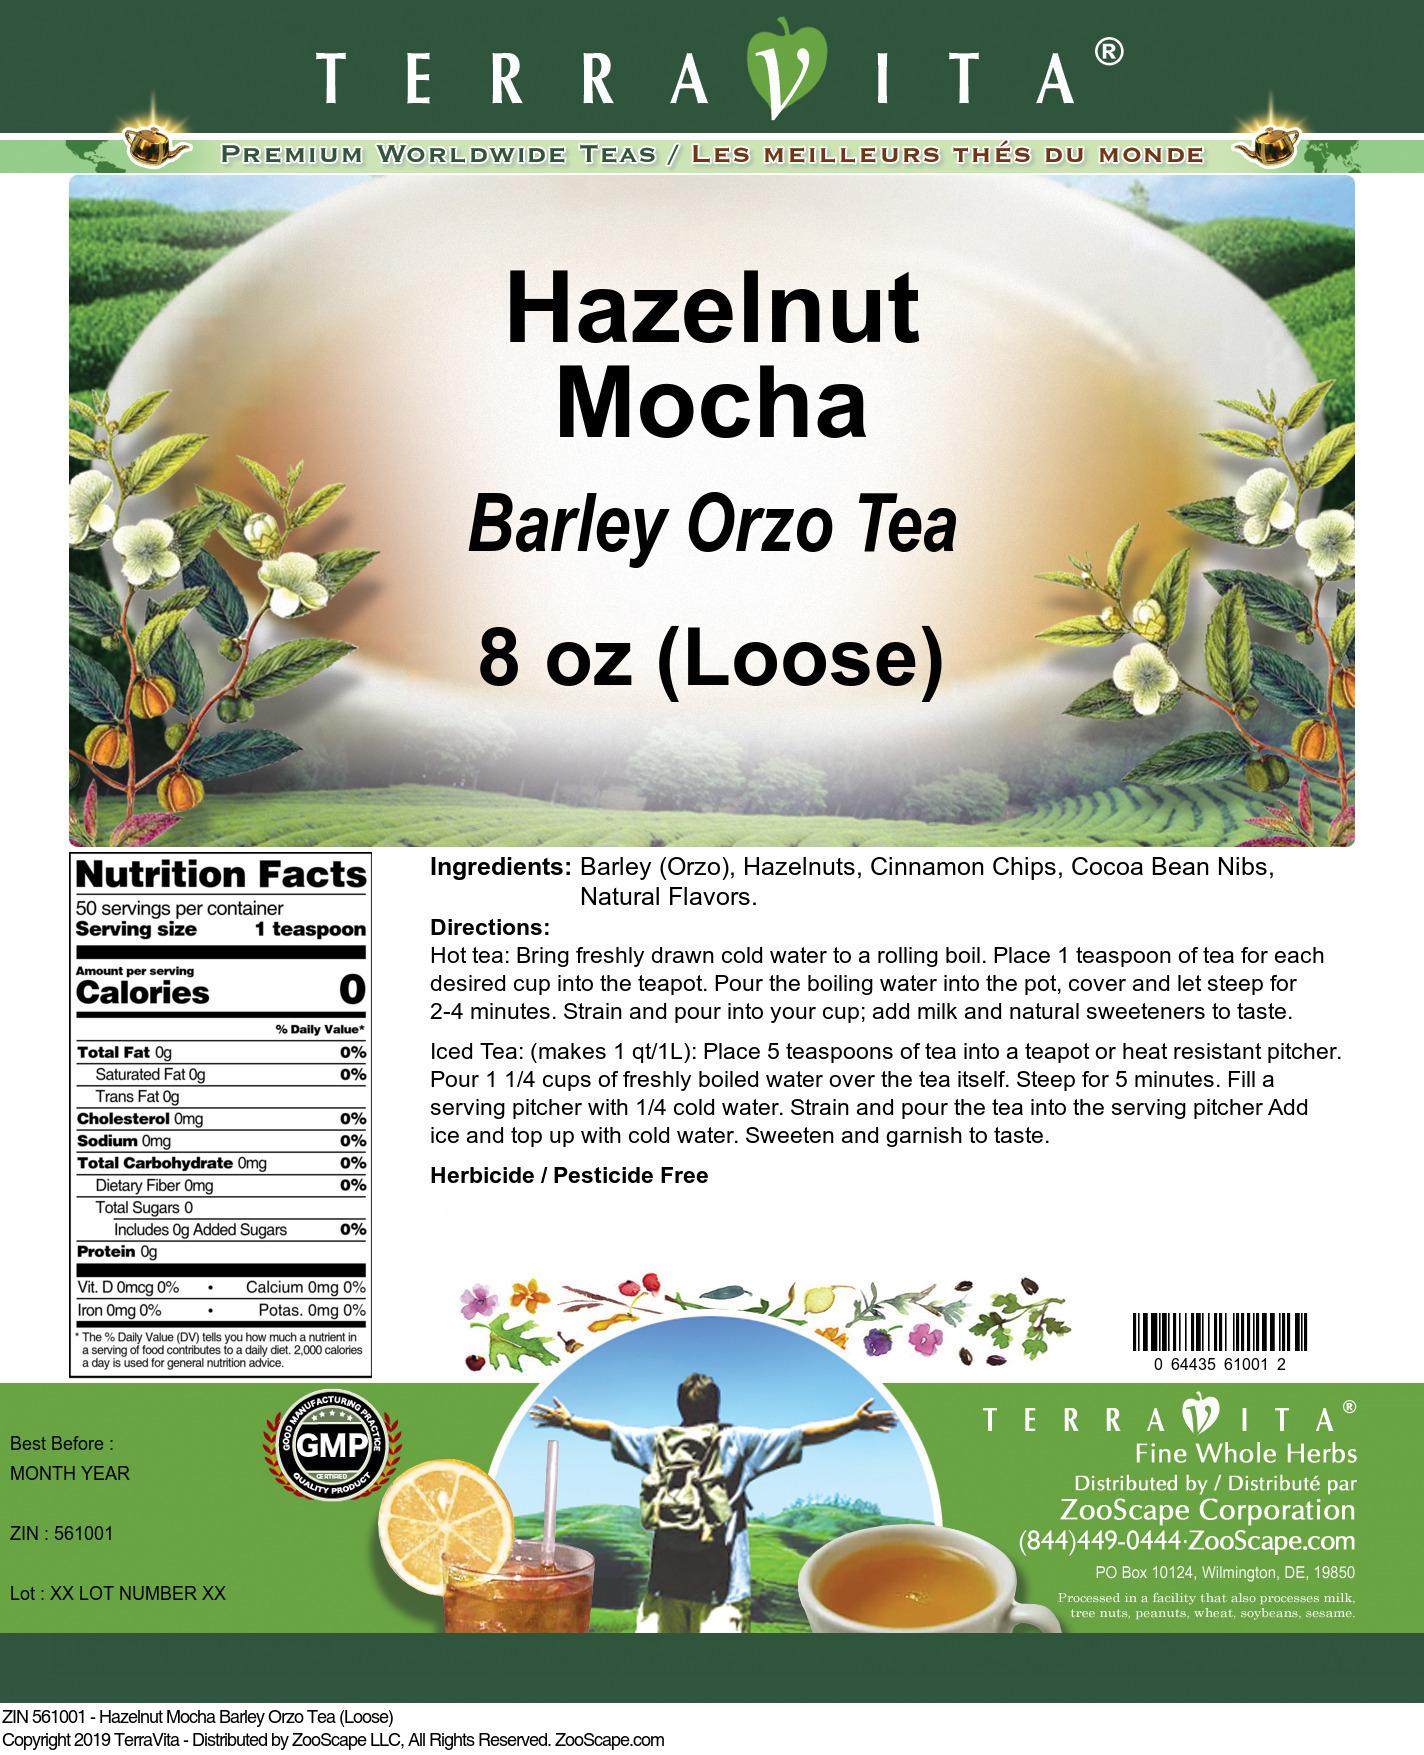 Hazelnut Mocha Barley Orzo